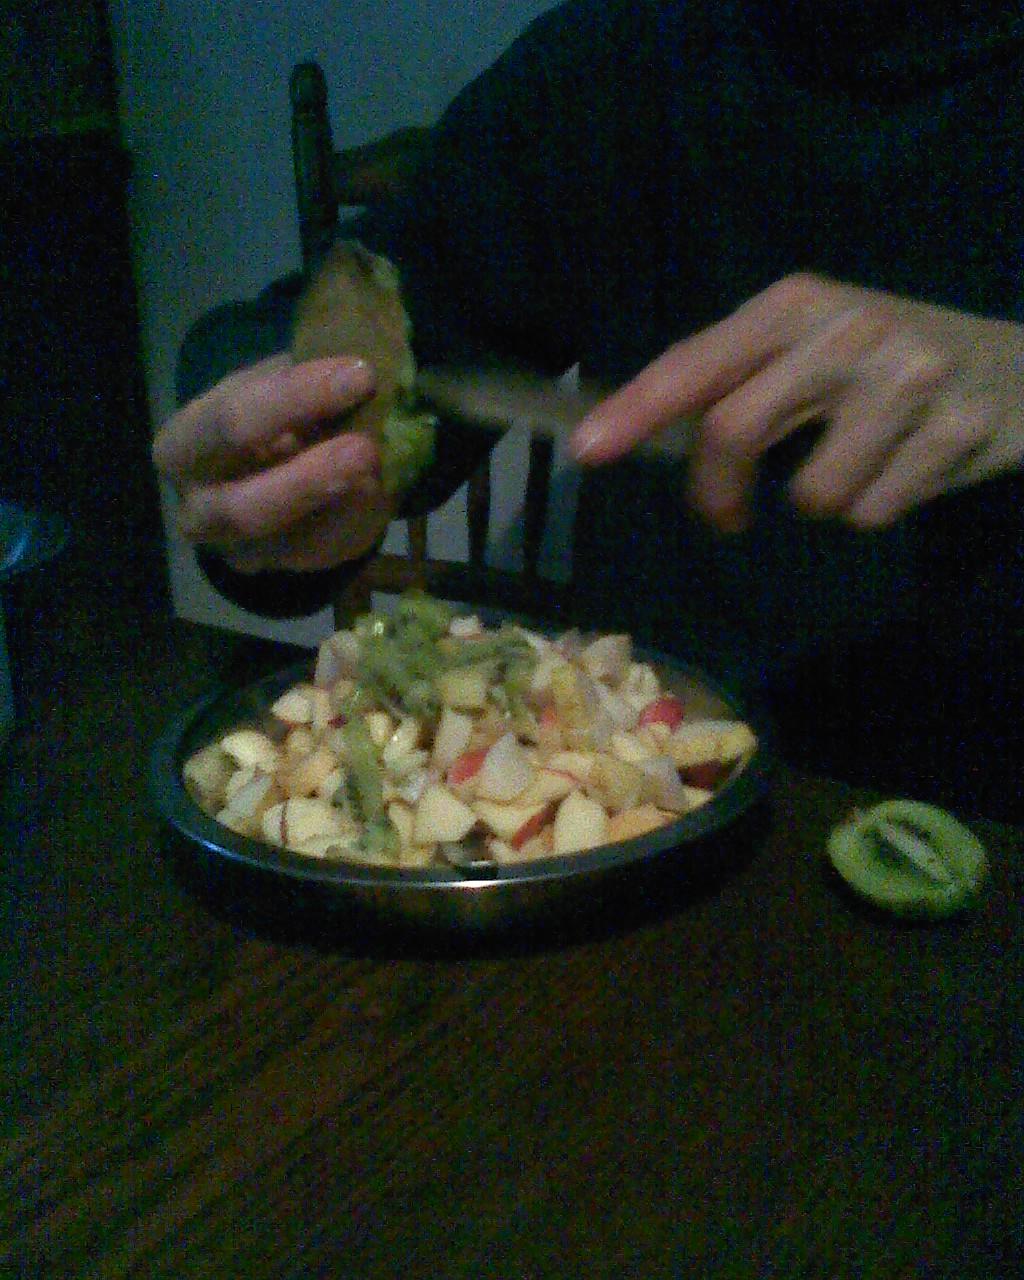 breakfast bowl of fruit